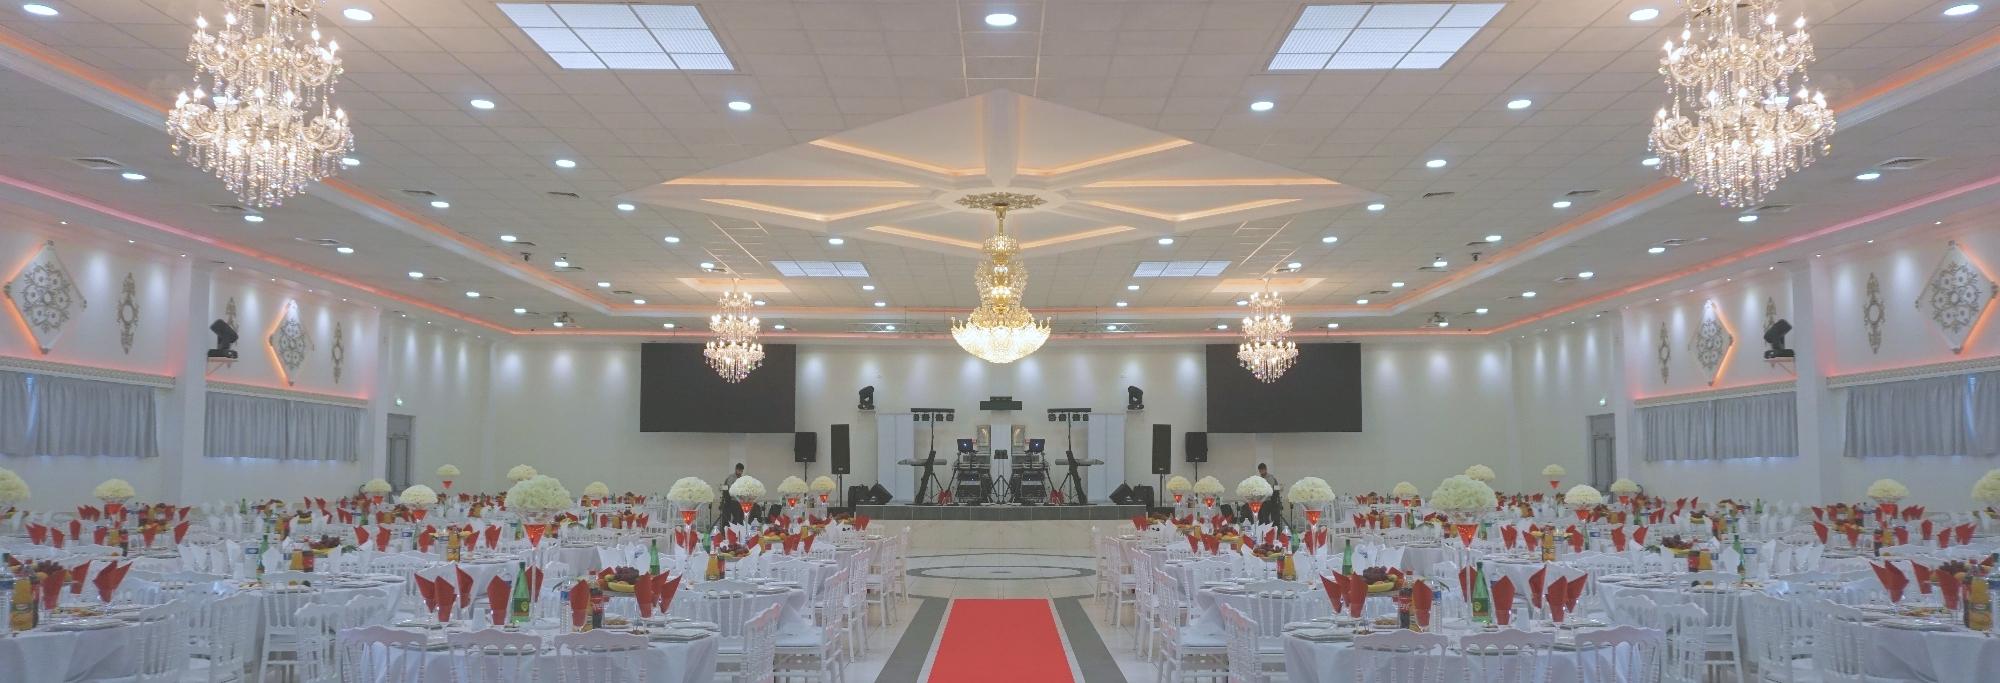 elysee mariage location de salle de r ception pour mariage. Black Bedroom Furniture Sets. Home Design Ideas